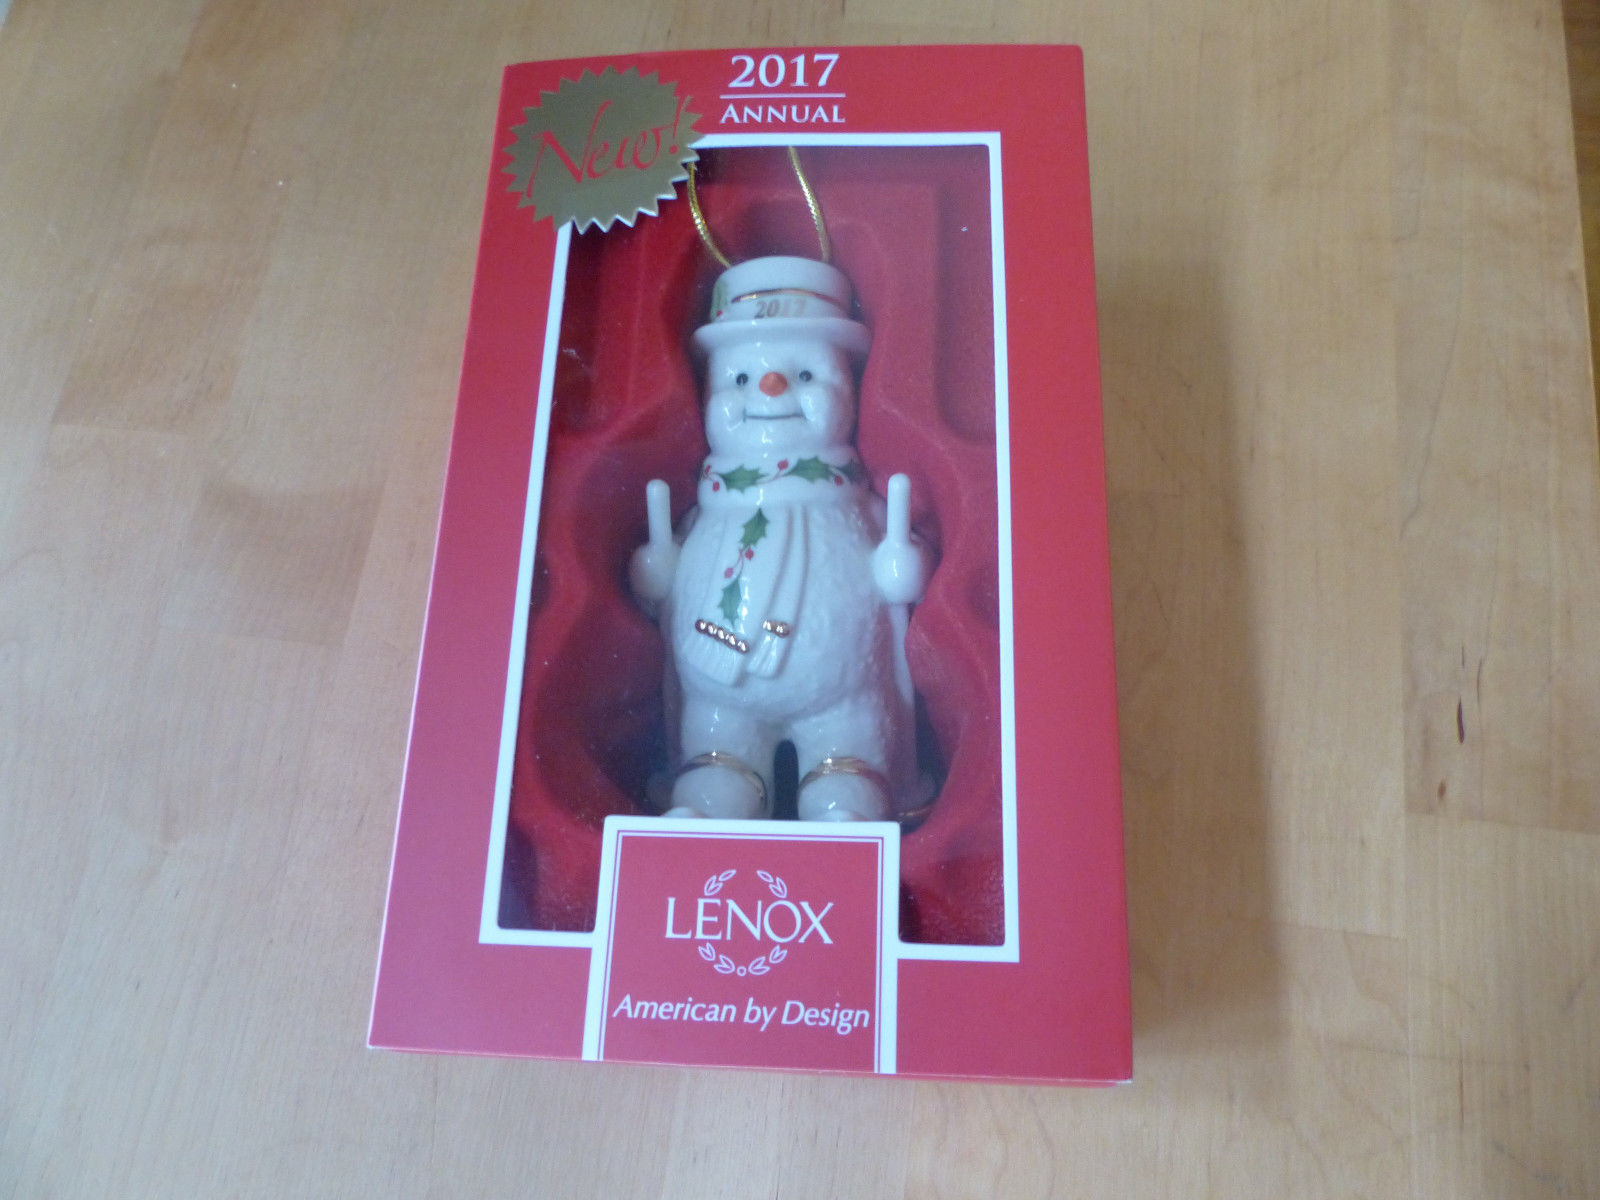 Lenox 2017 Snowman Figurine Ornament Annual Fresh Powder Happy Holly Skiing NEW